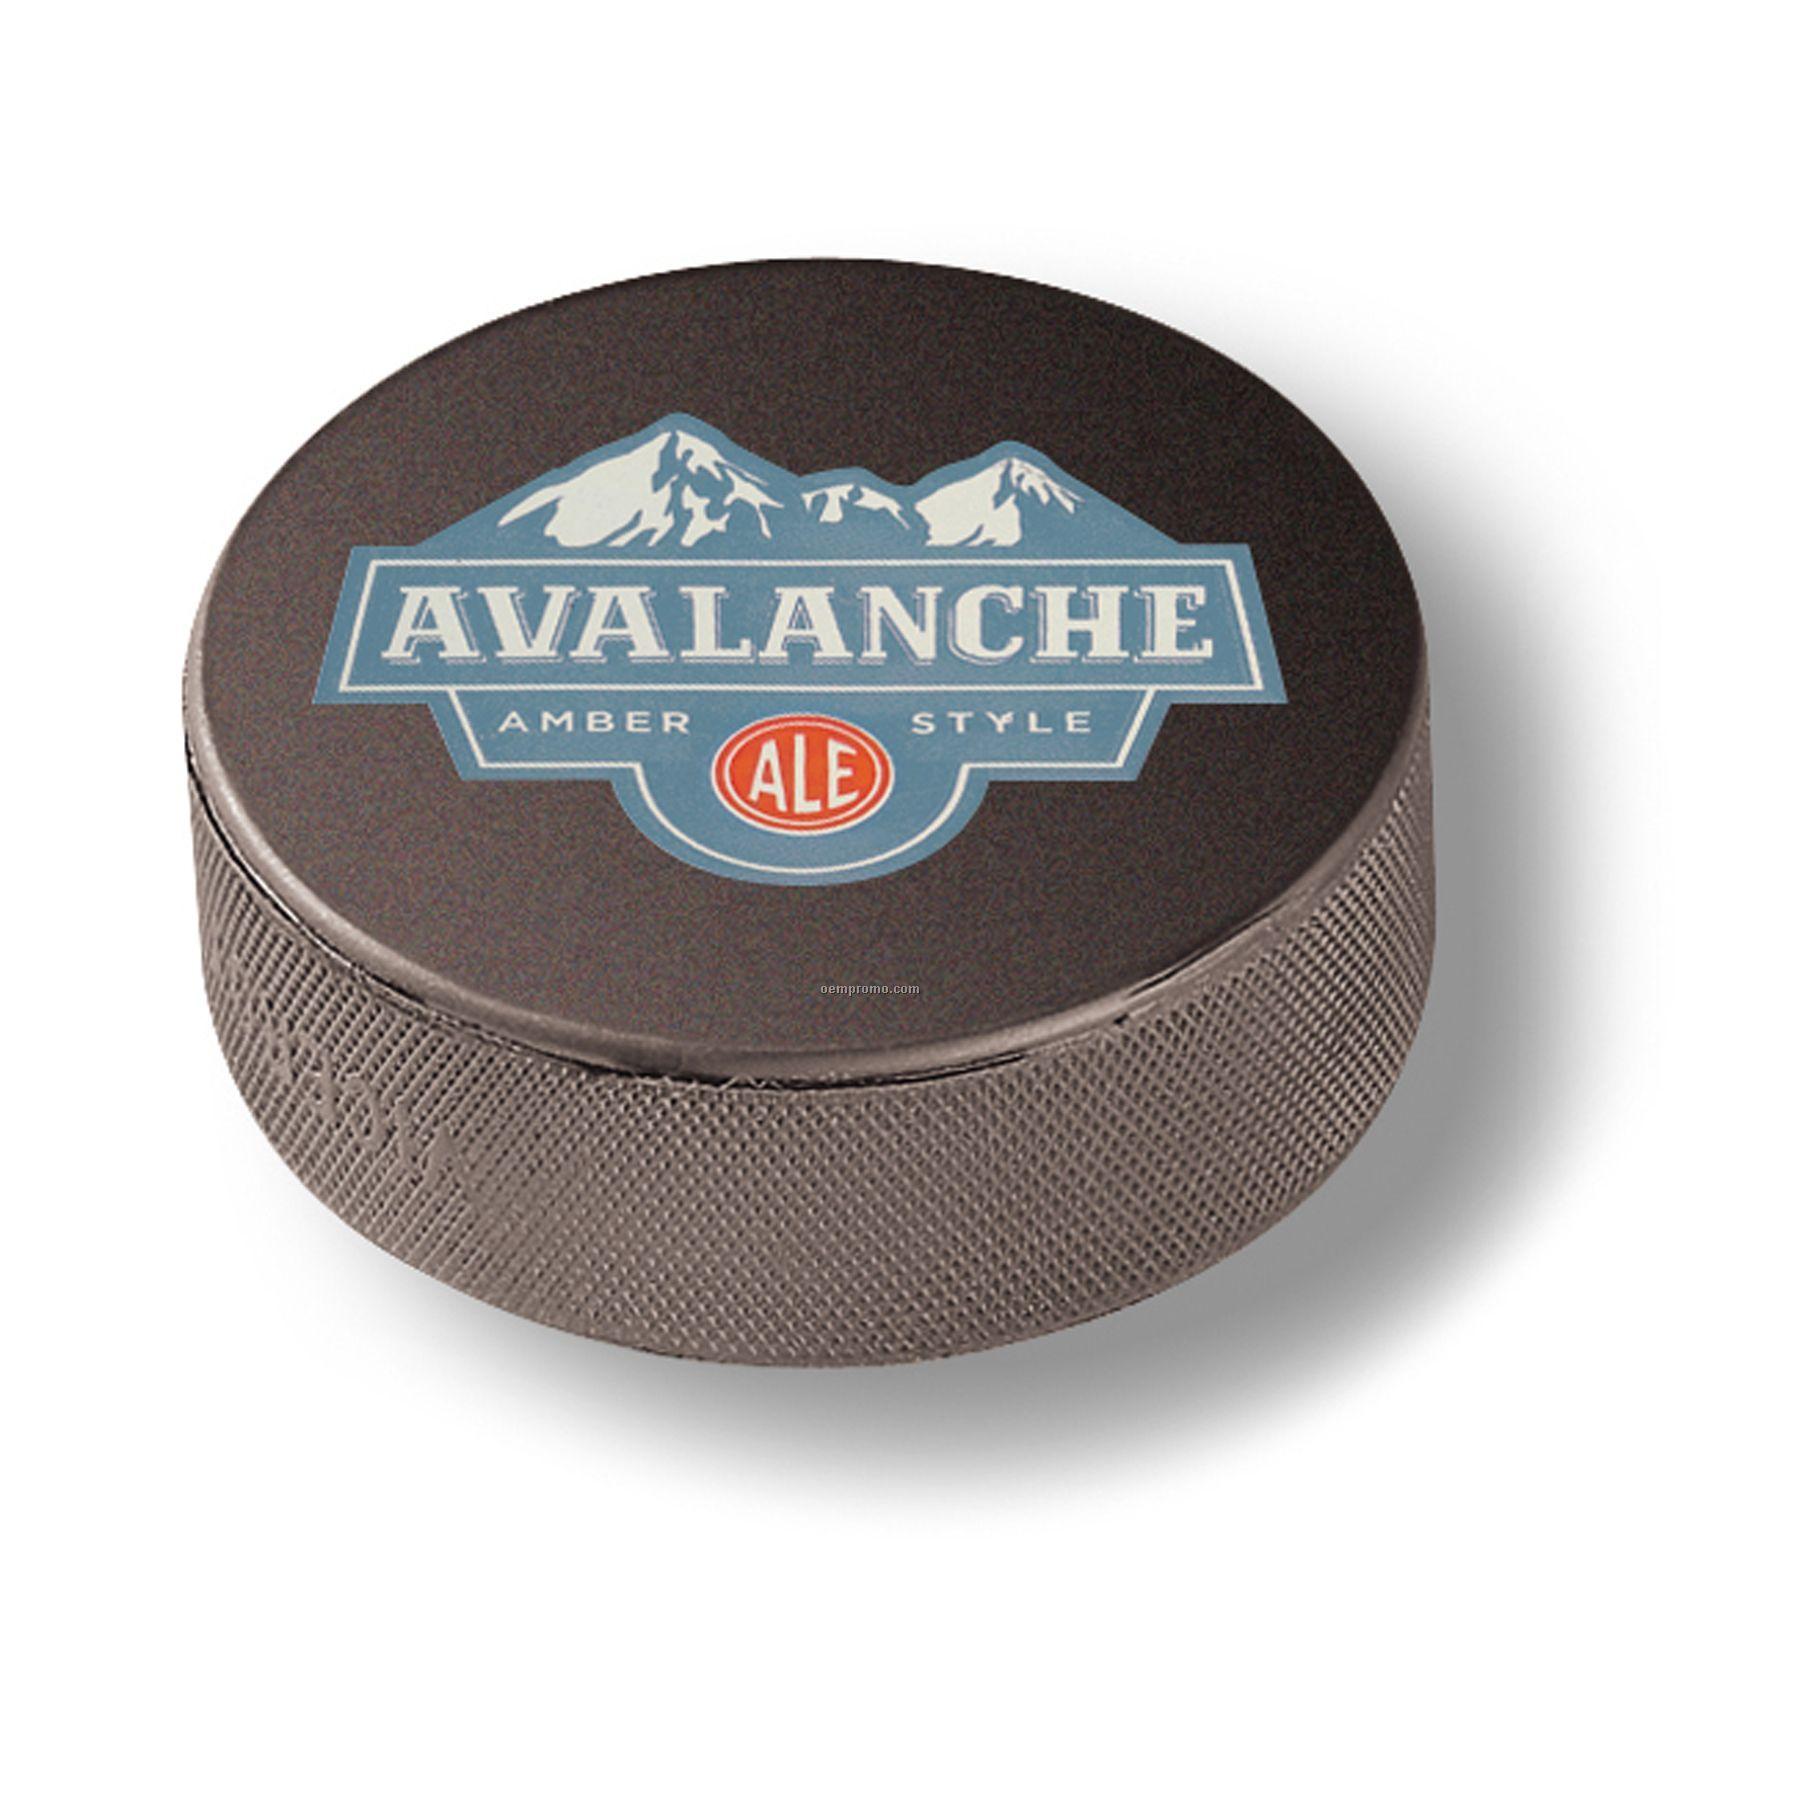 Official Size Souvenir Hockey Puck (2 Color)